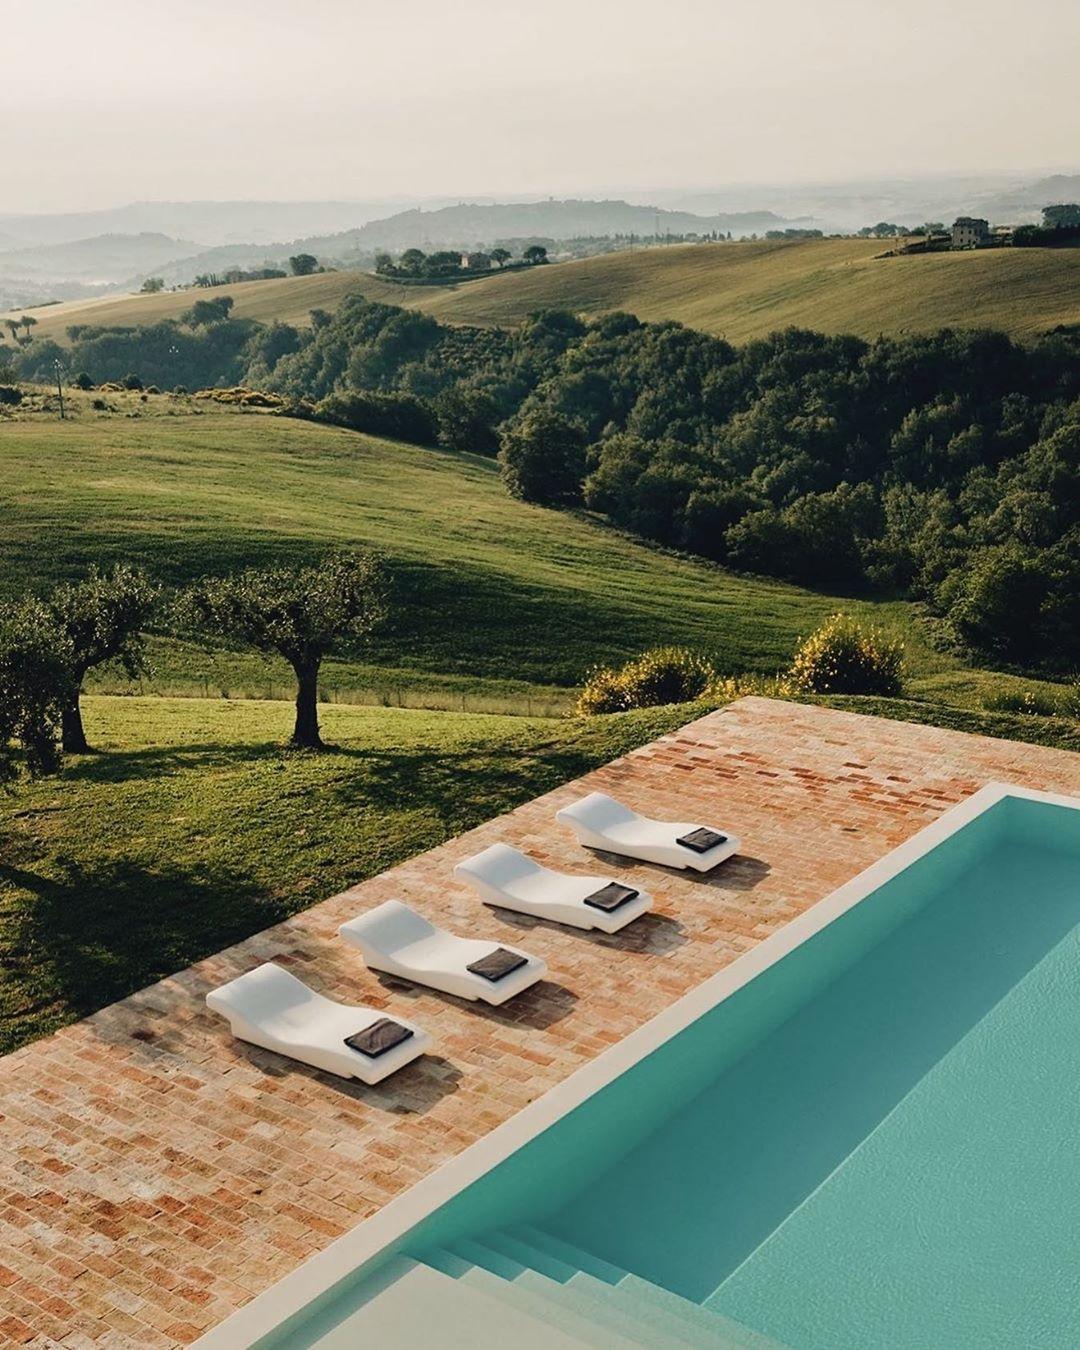 "@worldinstaplaces shared a photo on Instagram: ""Via@casaolivi I Italy 🇮🇹 I • • • • • • • • • #livetotravel #italy #italytravel #letsgoeverywhere#travelinspiration#travelbucketlist…"" • Sep 4, 2020 at 9:32pm UTC"